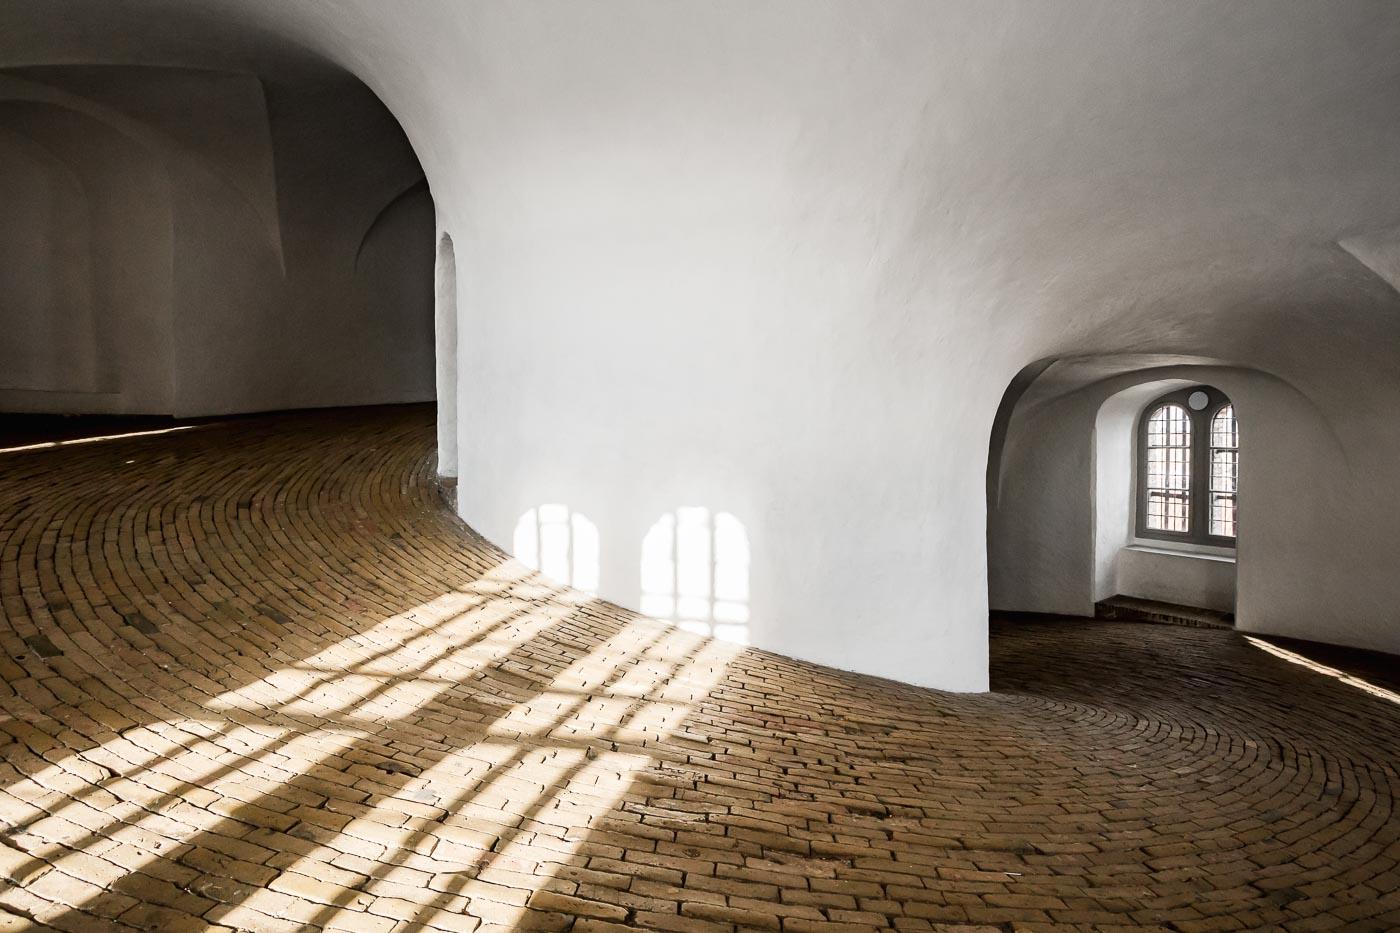 Kopenhagen Rundetårn